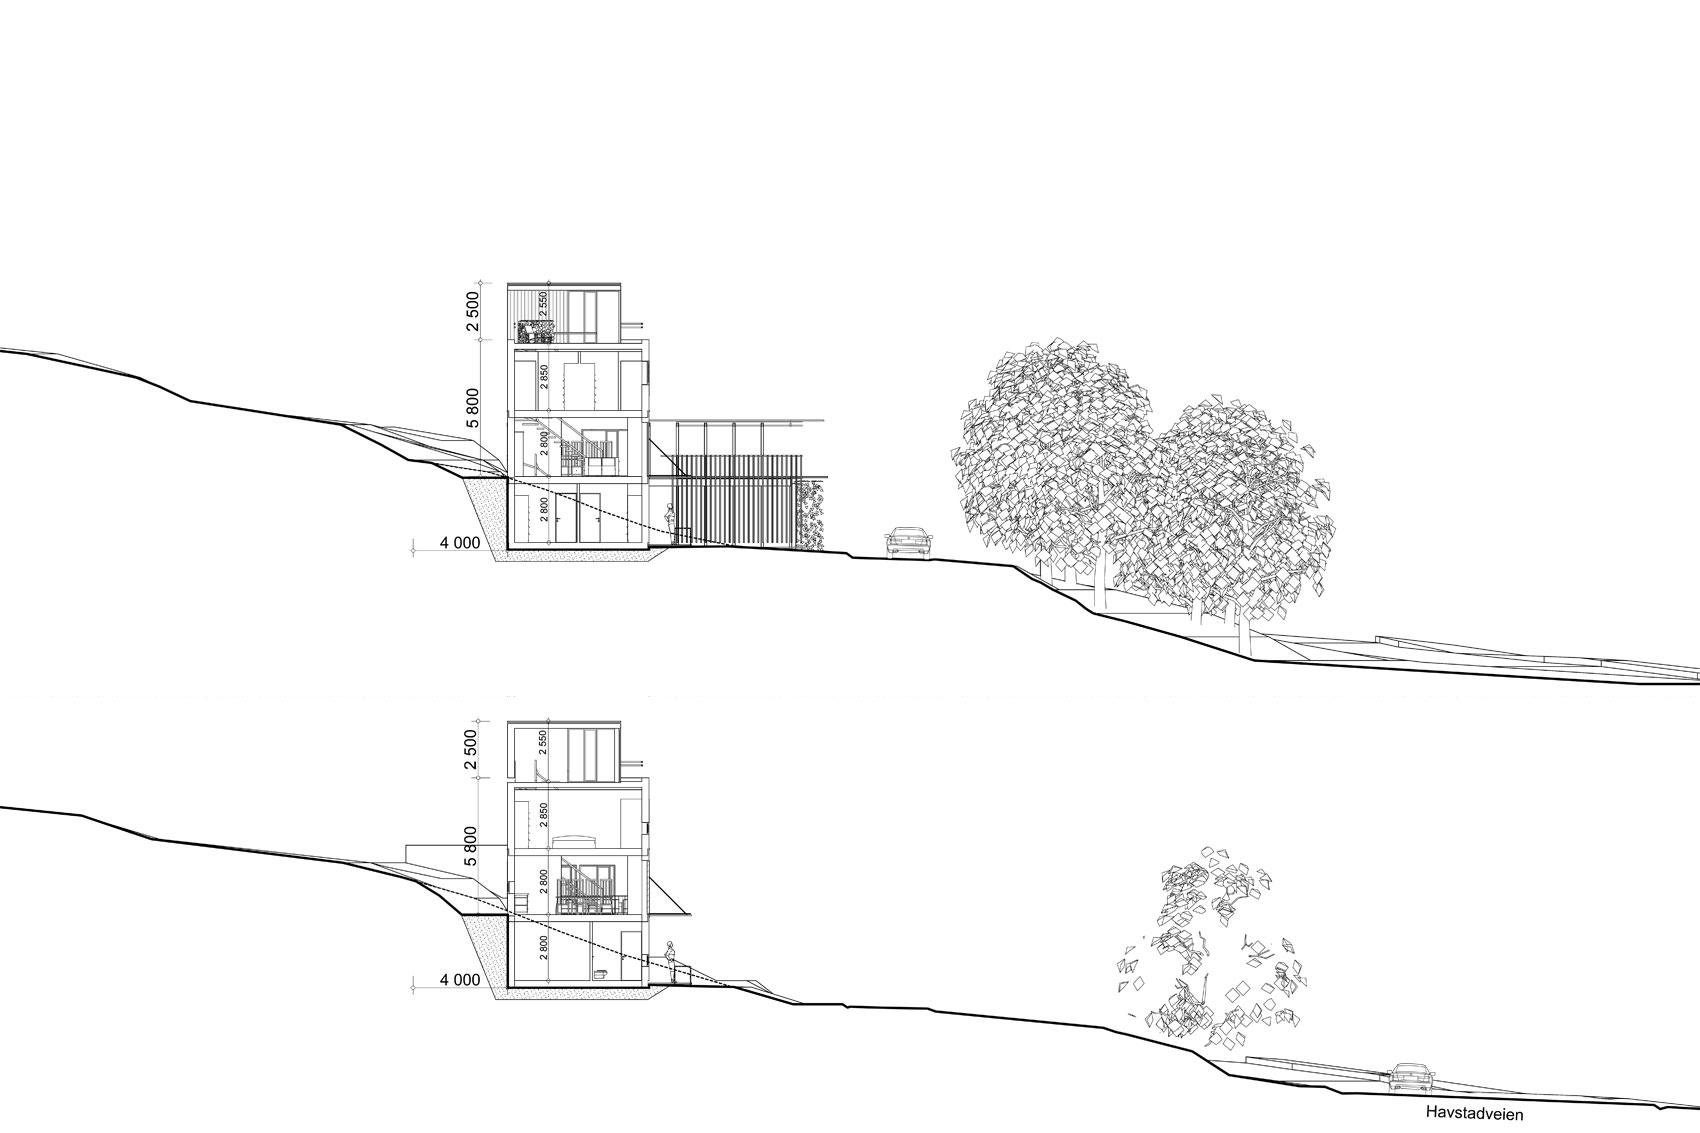 arkitektur_trondheim_havstein_enebolig_villa_hus_utsikt_panoramautsikt